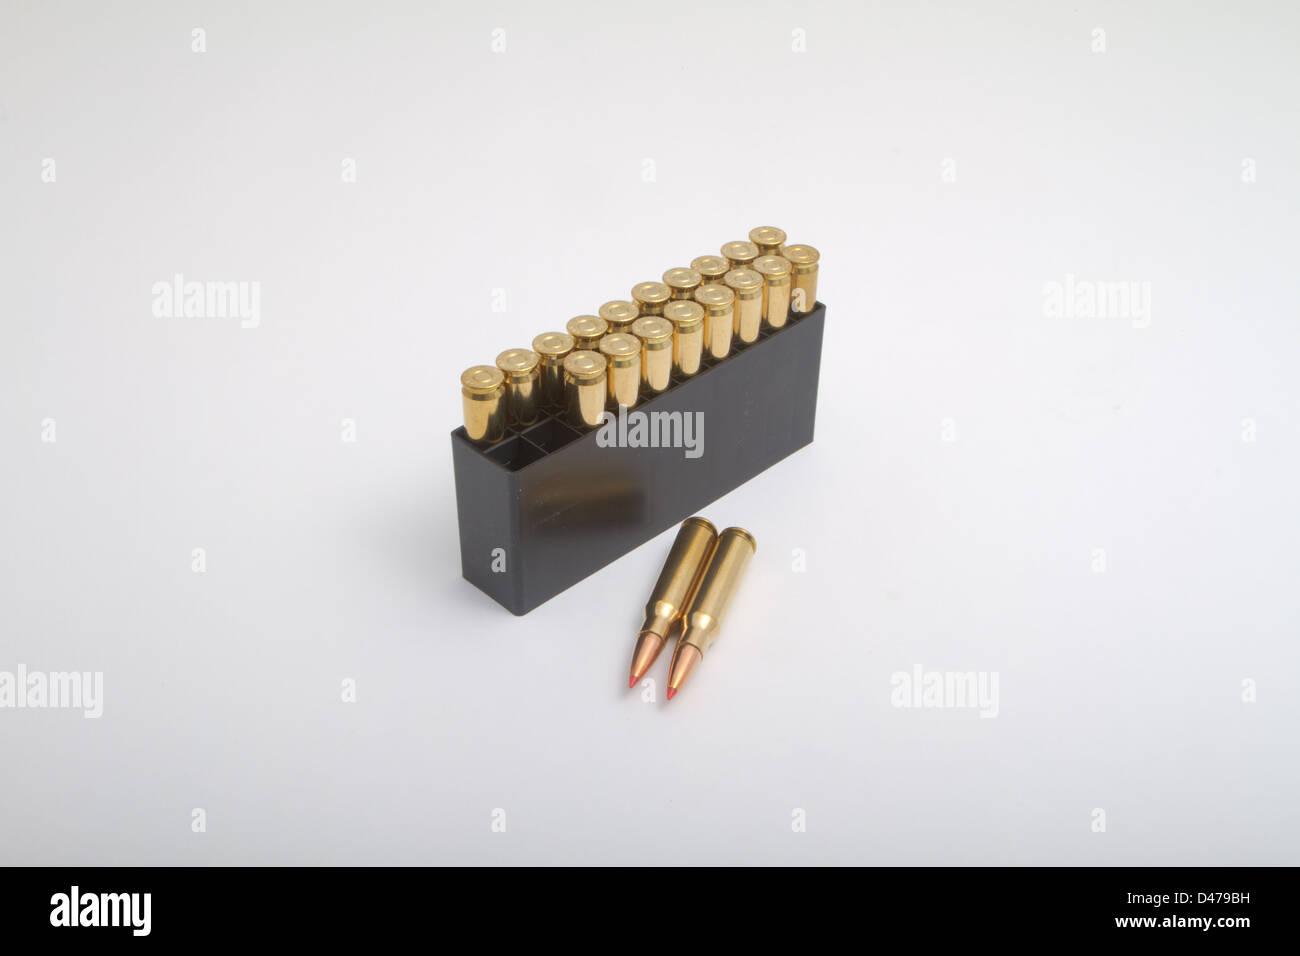 7.62x51mm 308 Ammo .308 / 7.62 NATO - Stock Image